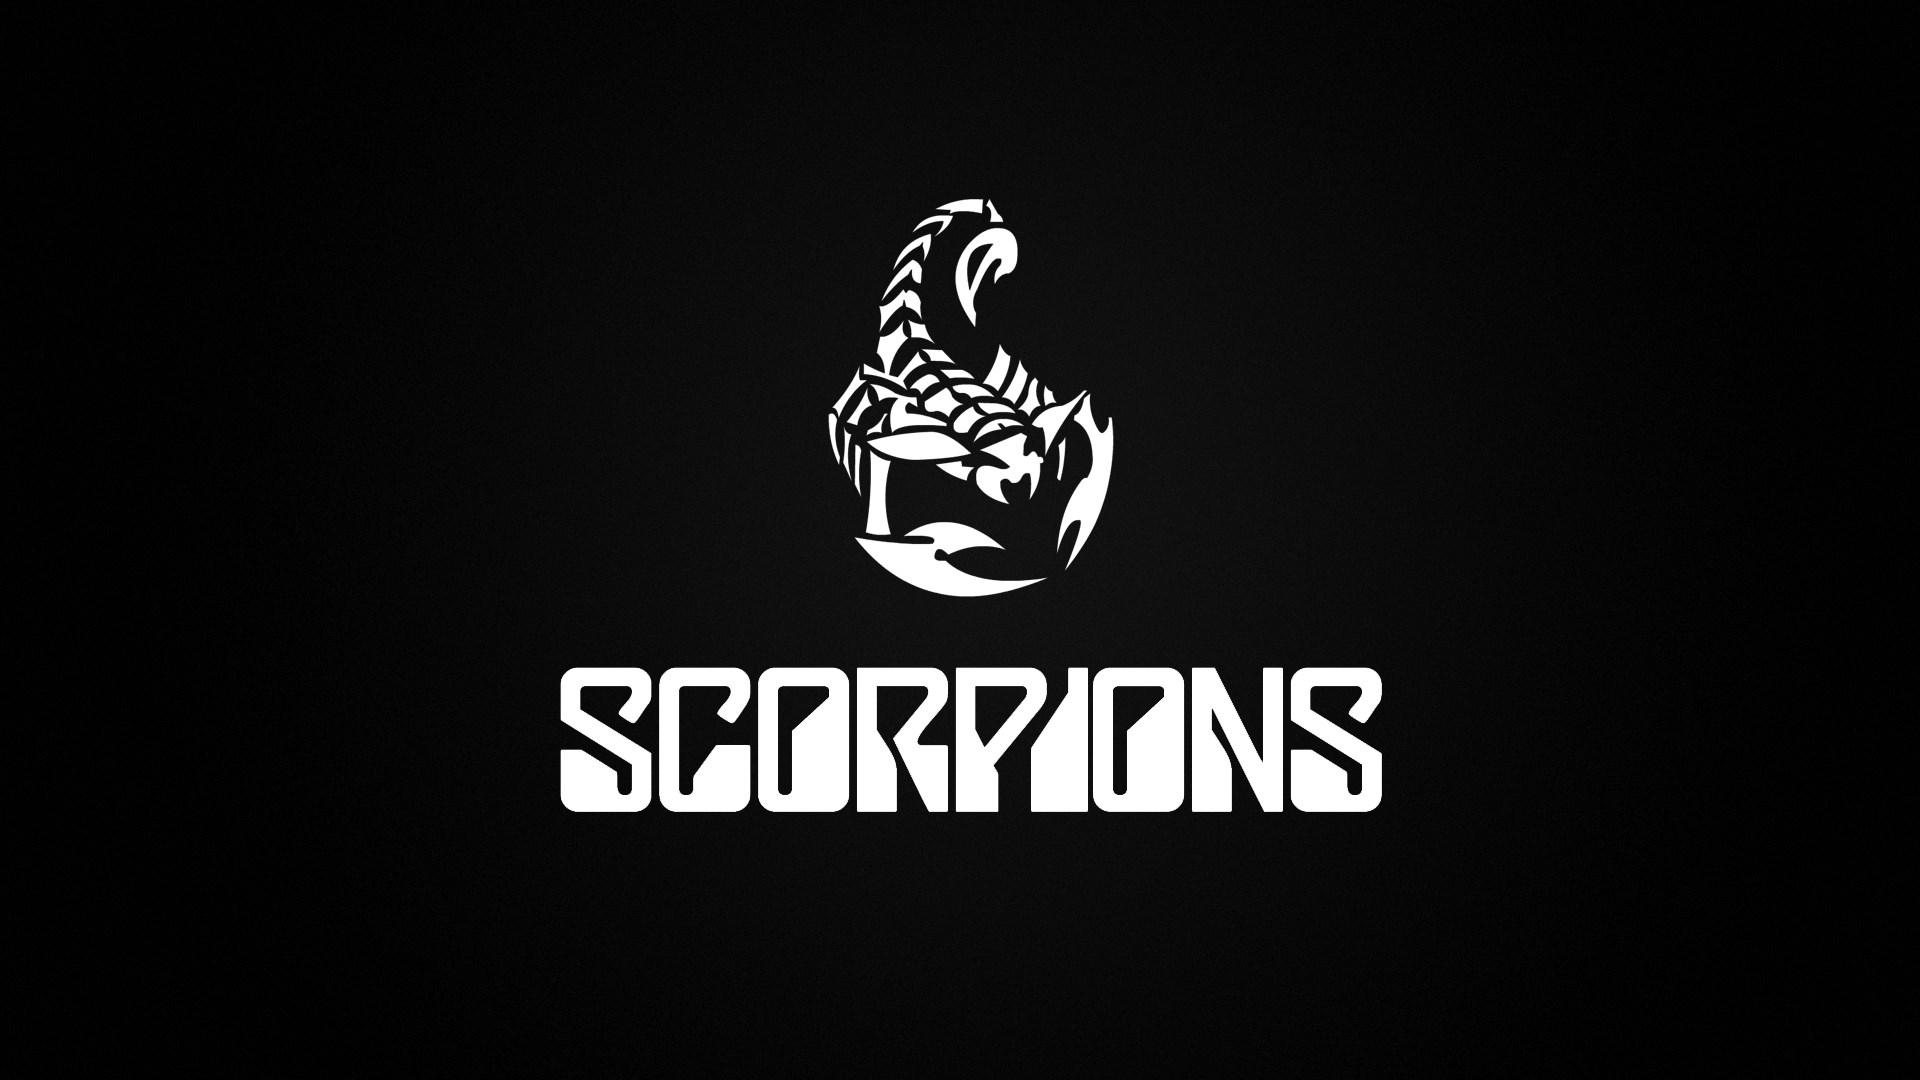 Scorpions Rock Logo